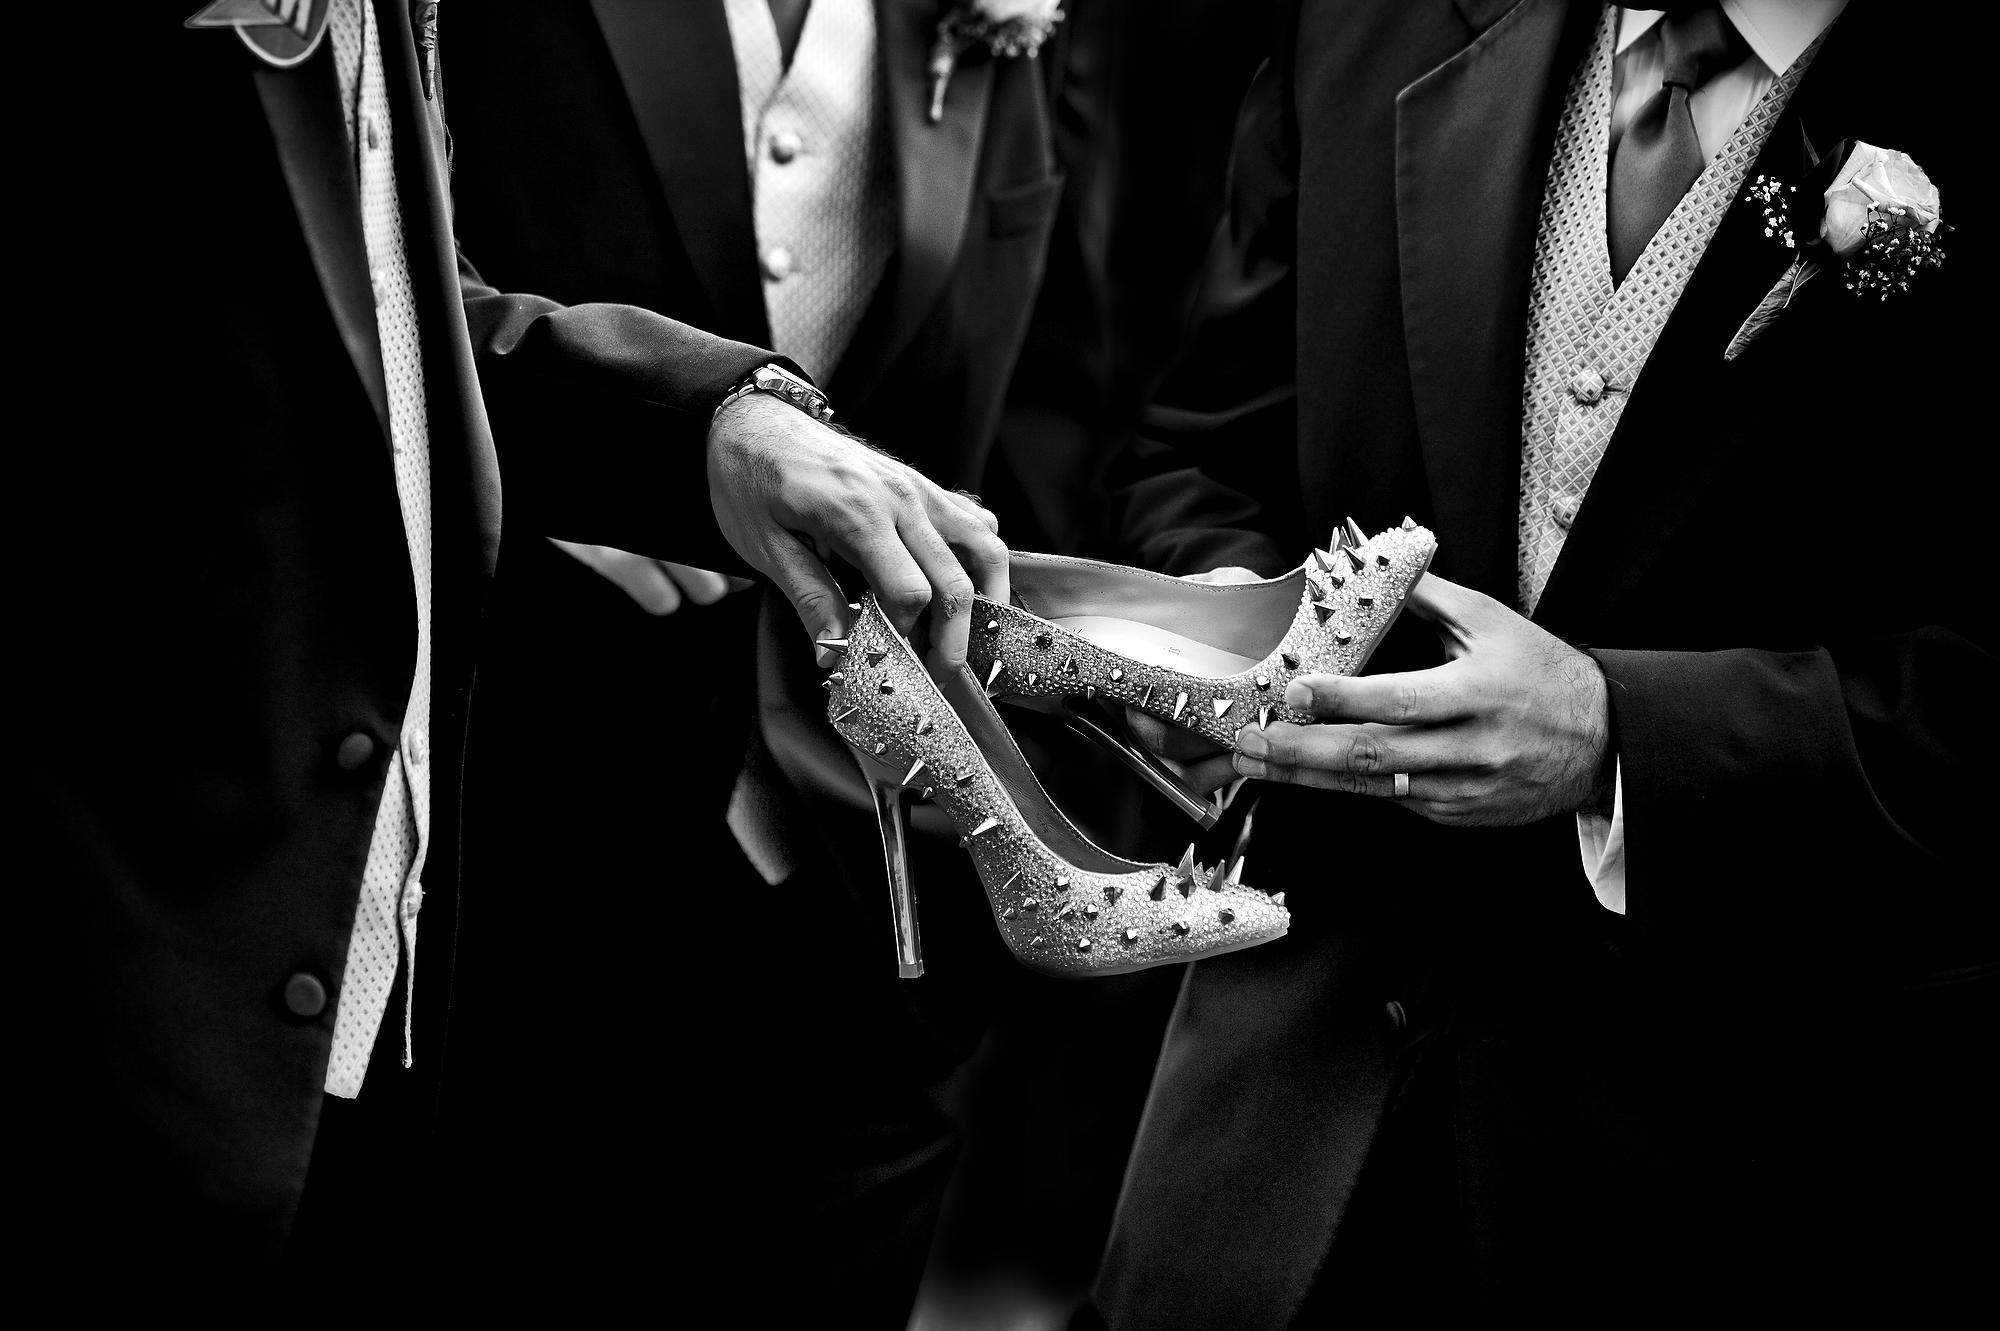 men-handling-spiky-high-heel-shoes-matthew-sowa-photography